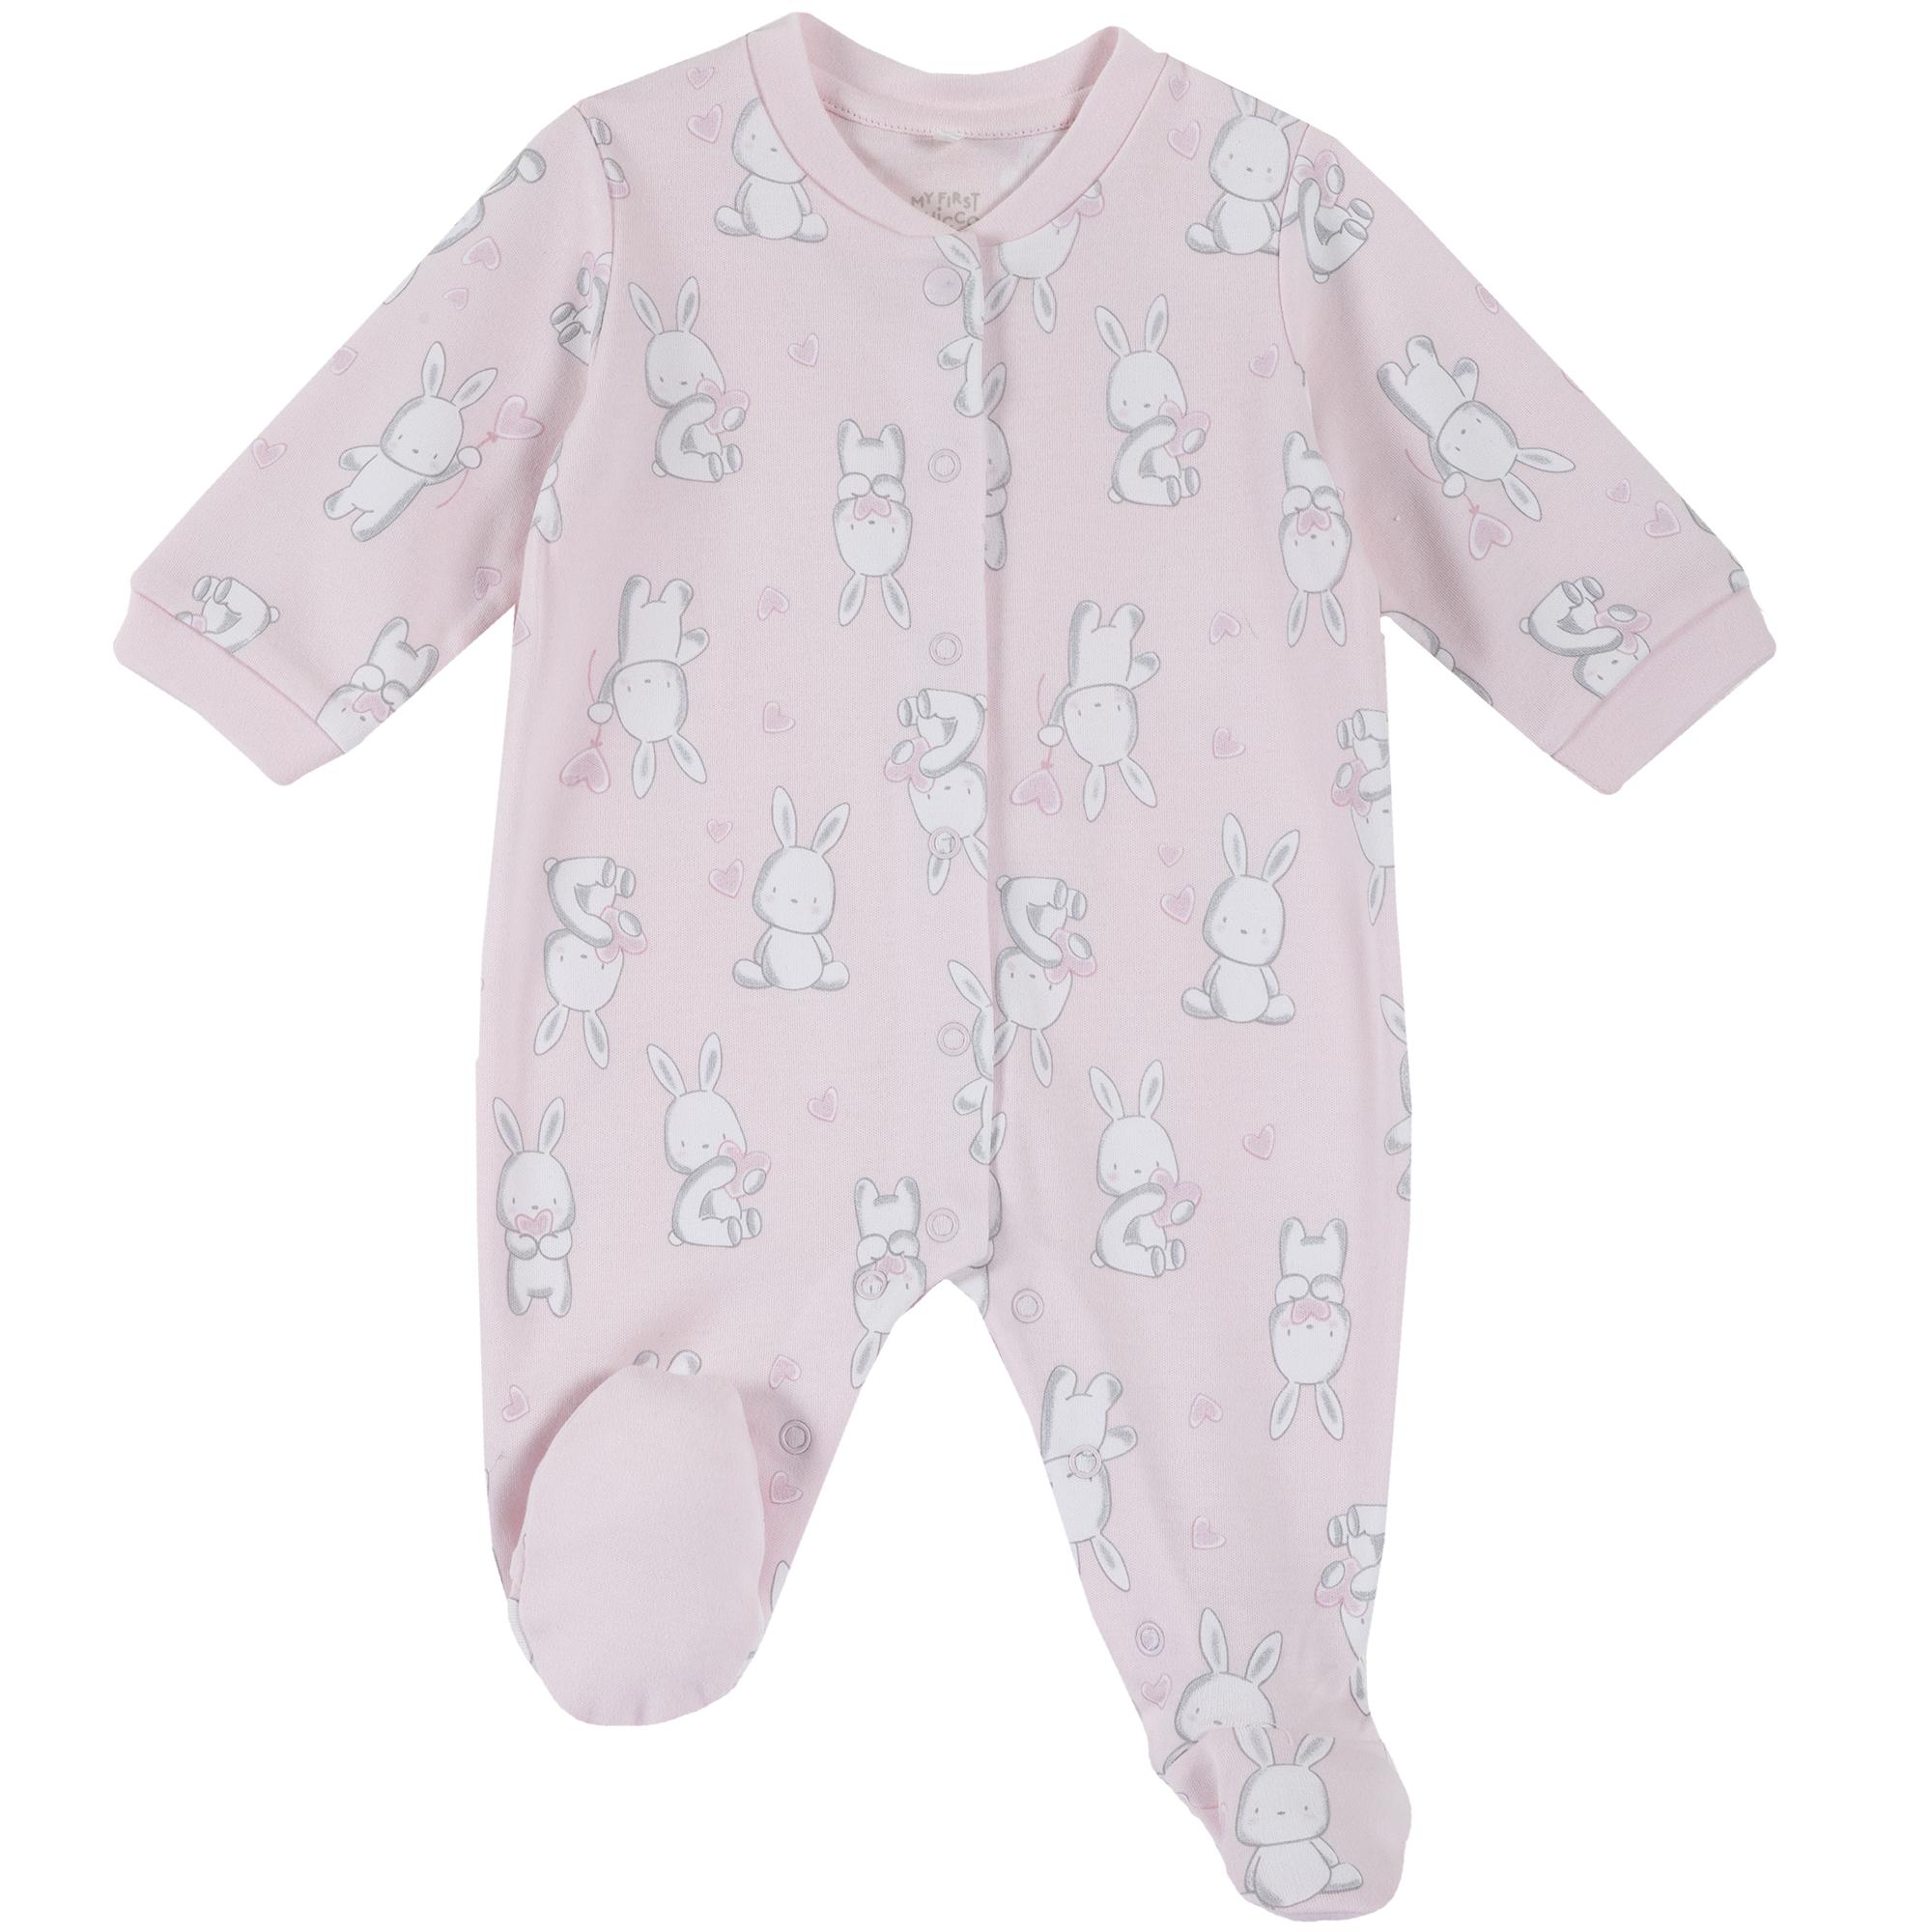 Salopeta copii Chicco, roz, imprimeu ursuleti, 21862 din categoria Salopete/Body